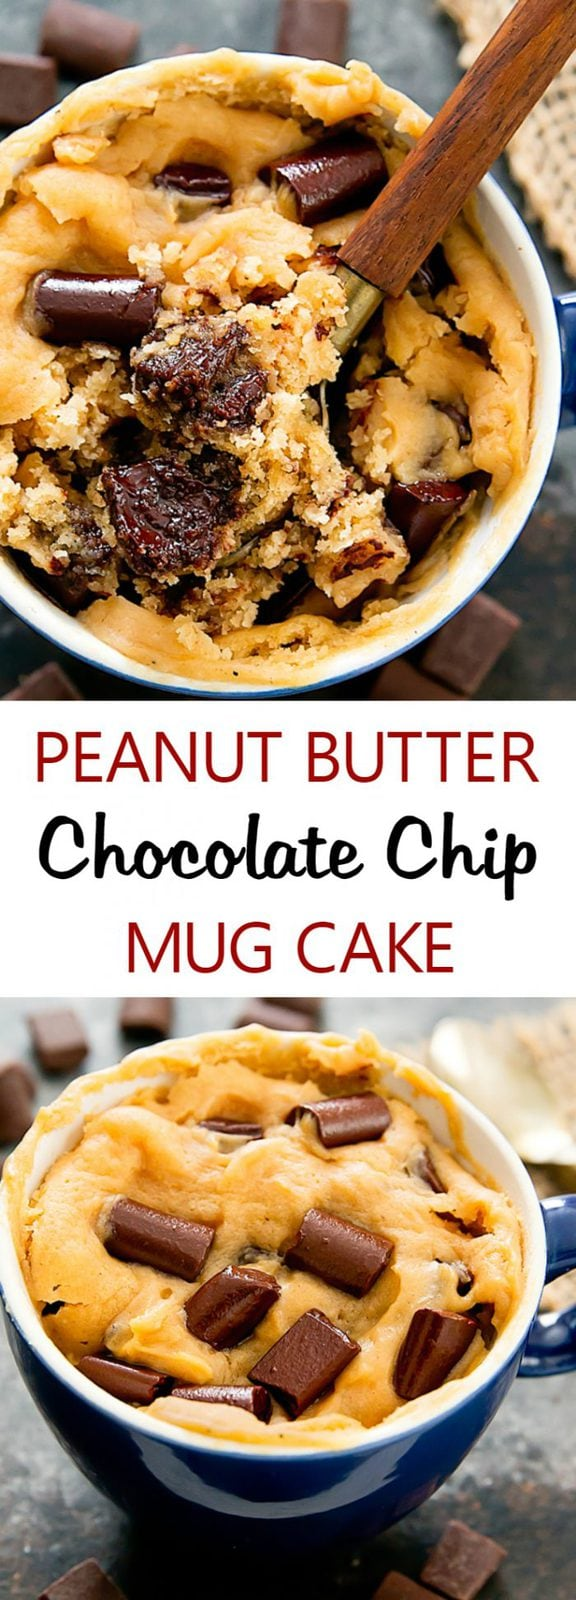 Eggless Peanut Butter Chocolate Chip Mug Cake